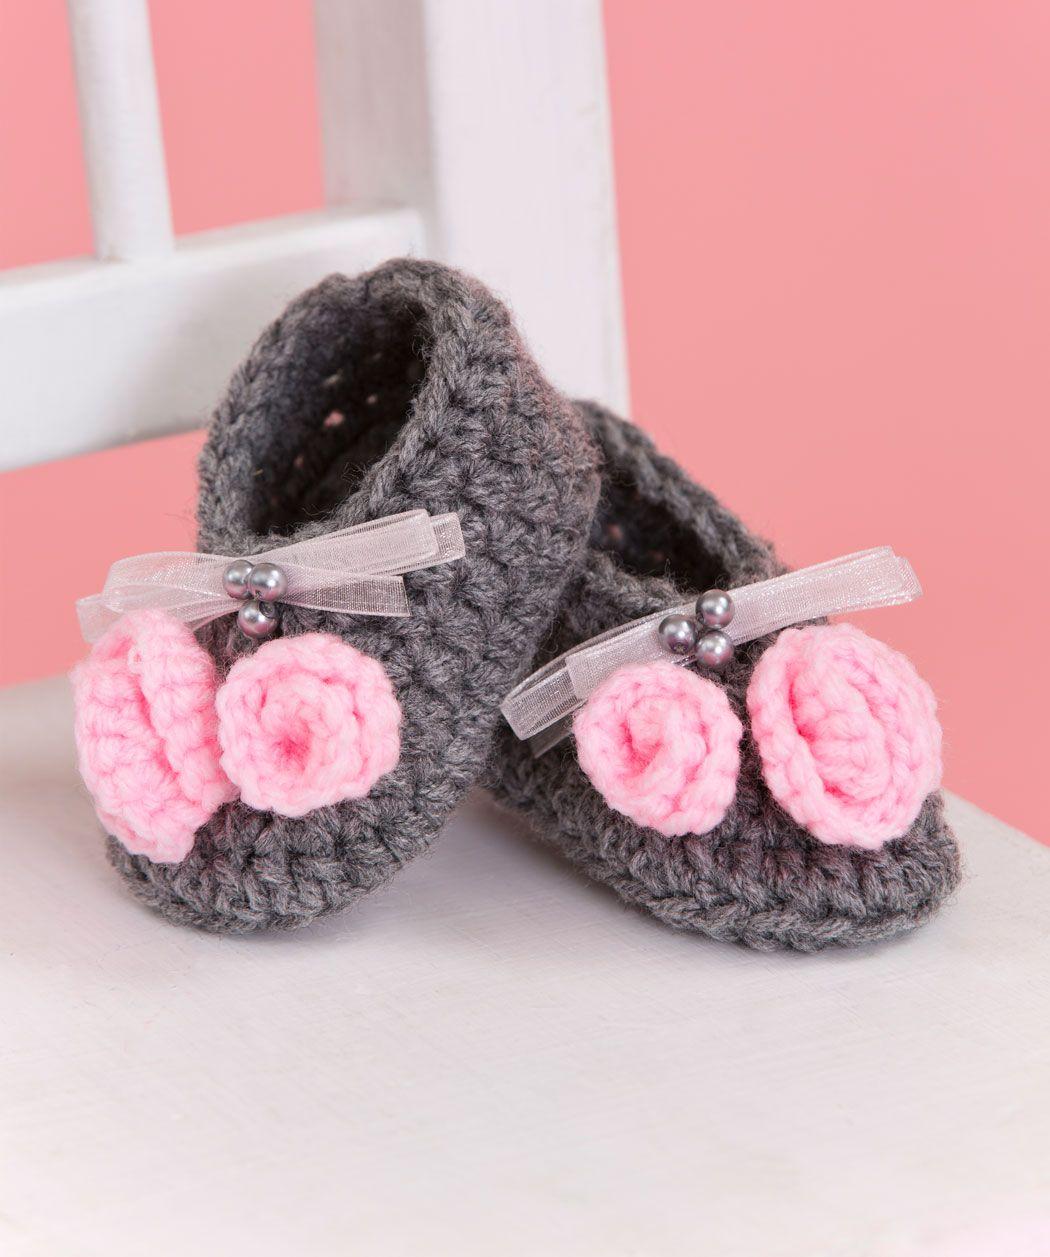 Little Miss Booties Free Crochet Pattern from Red Heart Yarns